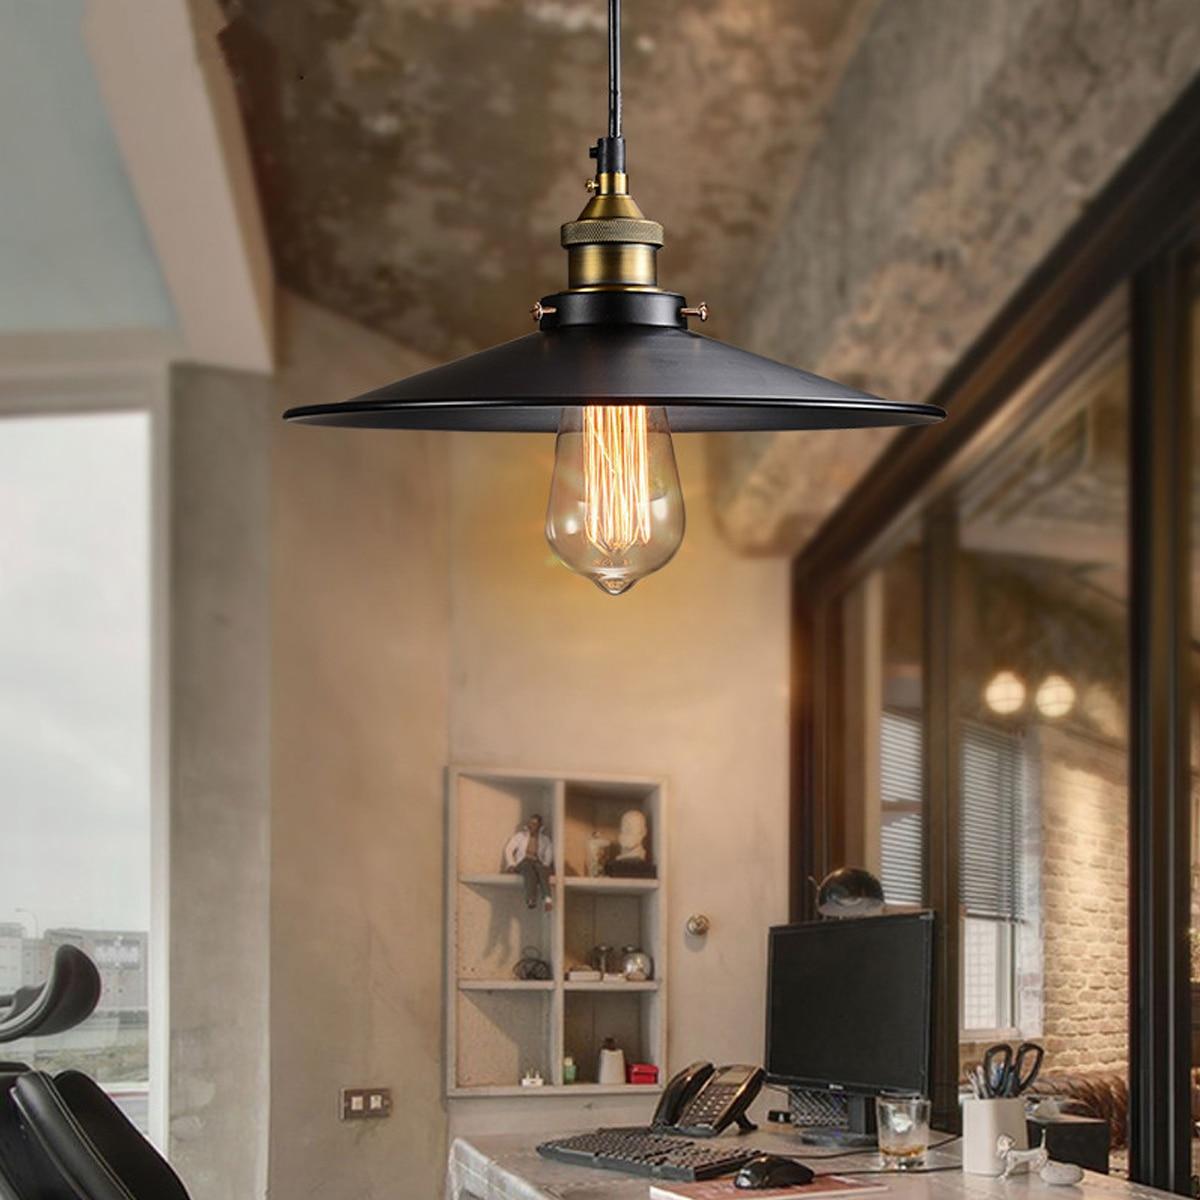 26cm Loft Vintage Ceiling Lamp Retro Industrial Chandelier Fixture For Cafe Restaurant Bar American Style Metal Light Ceiling Lights Aliexpress